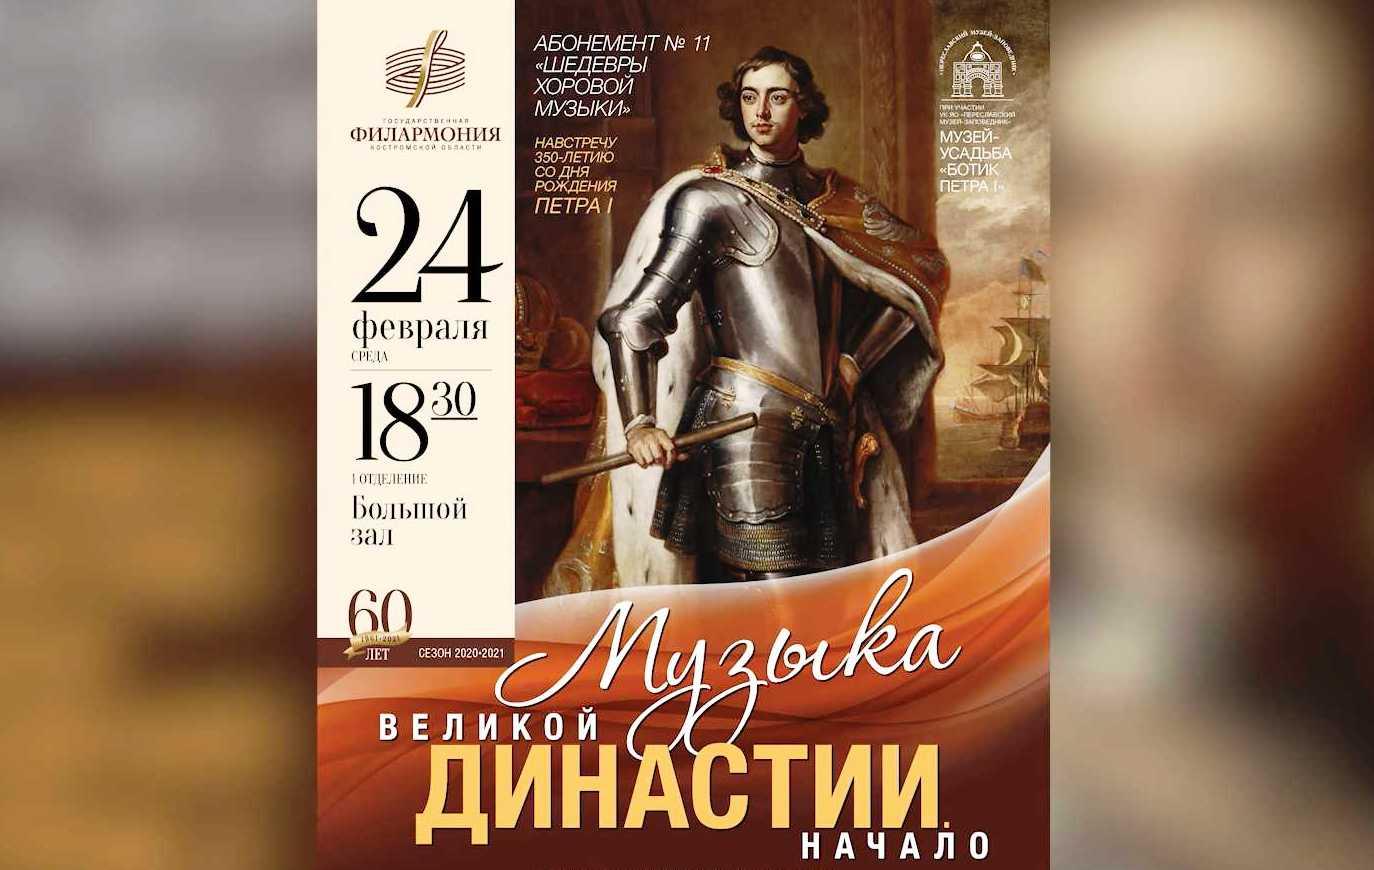 Музыка эпохи Петра I зазвучит в Костромской филармонии